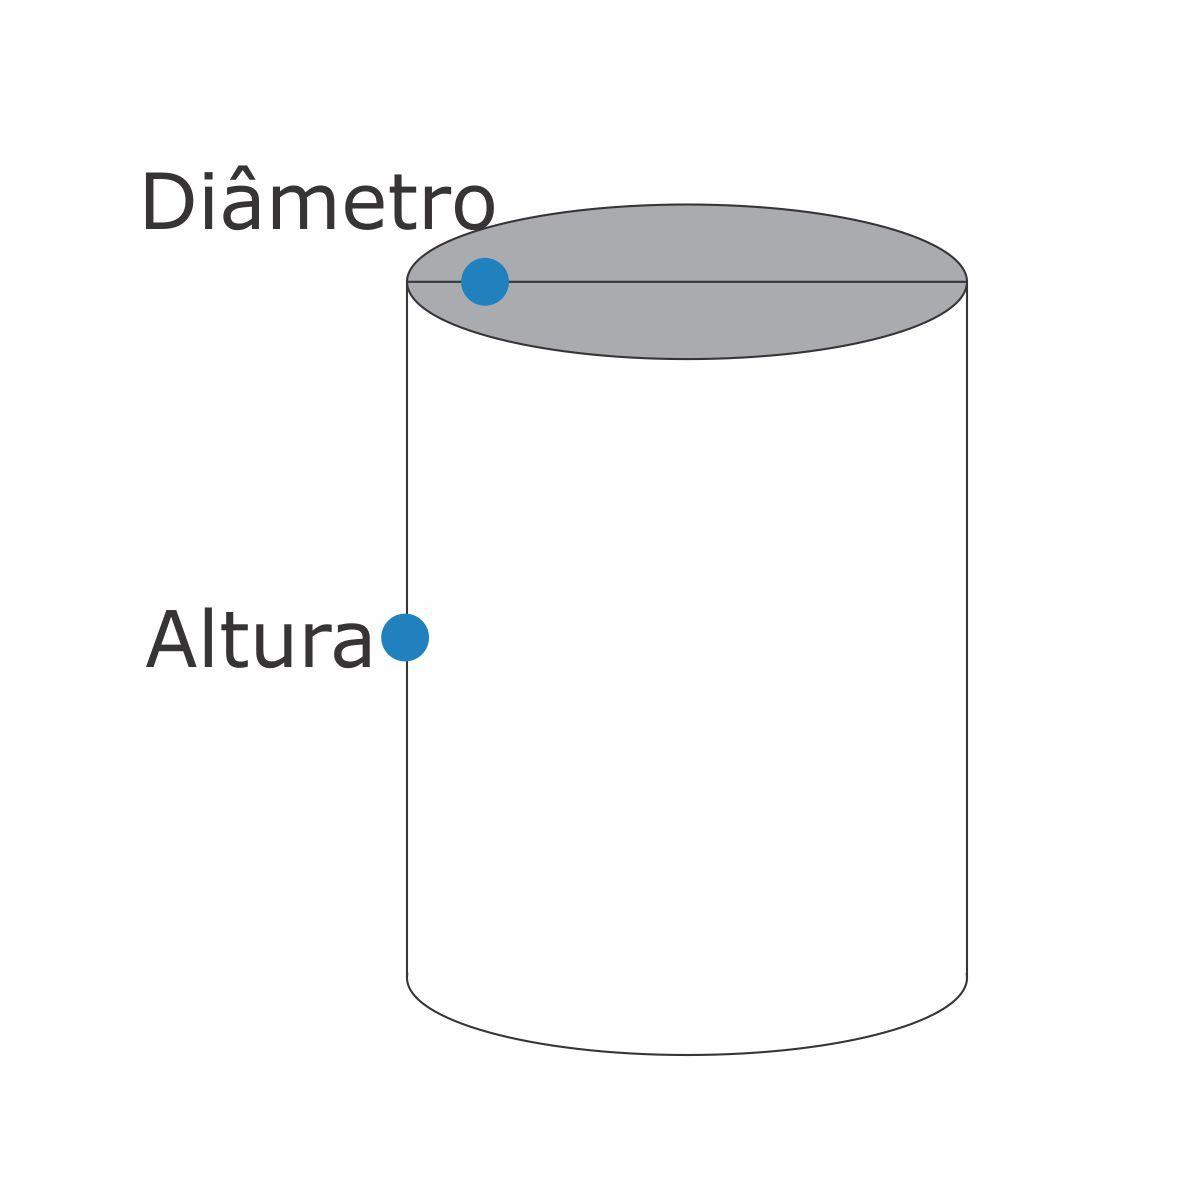 Poste Solarium Reto C/ 1 Globo C/ 2Mt De Altura - FUNDIÇÃO VESUVIO